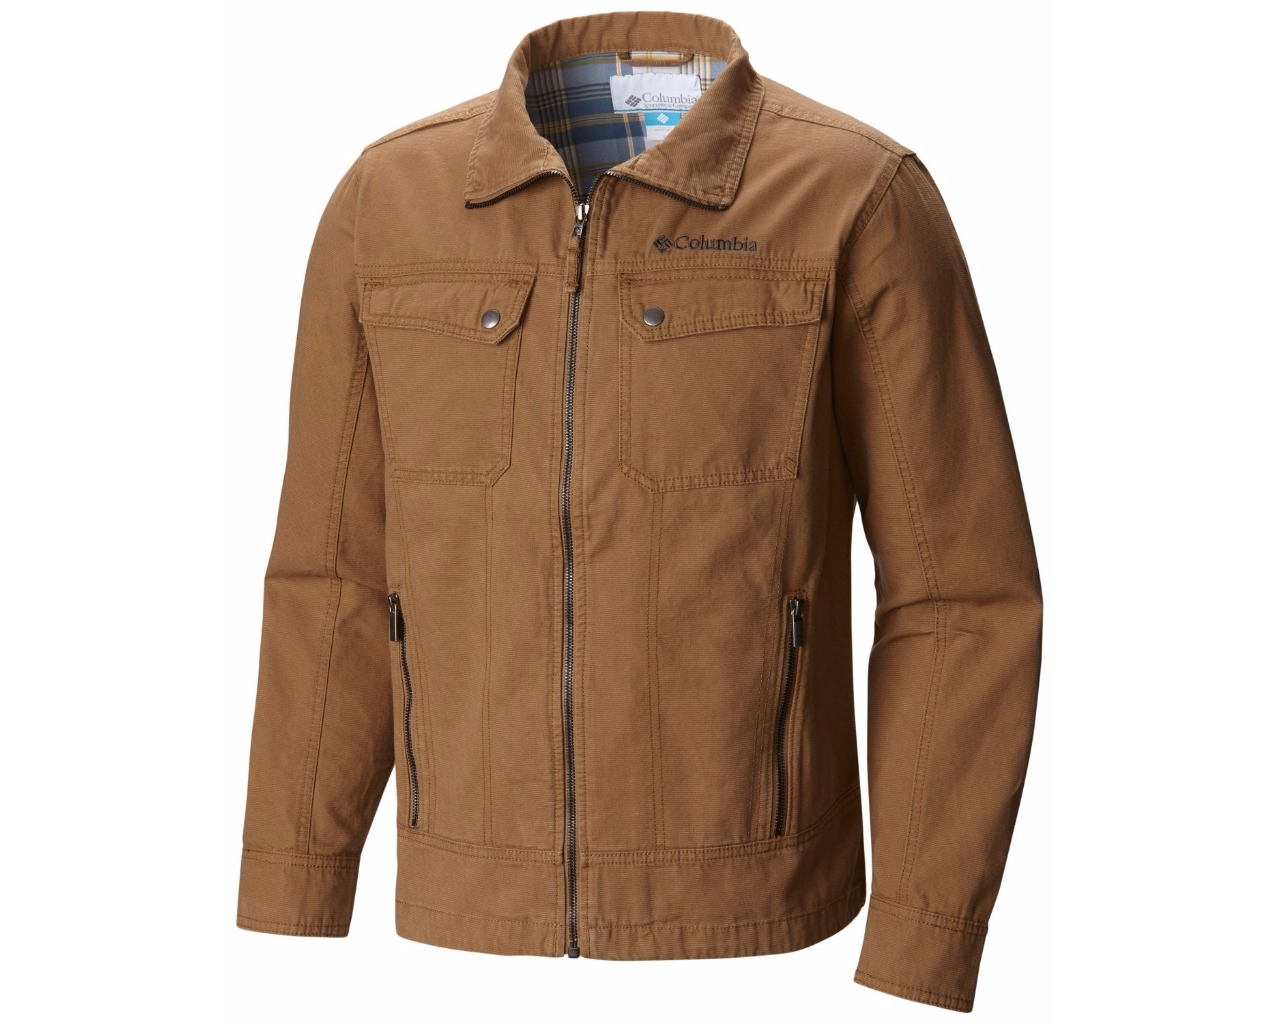 736935f53d24 Sale Куртка-ветровка мужская Columbia Rough Country™ коричневый  арт.1580181-257